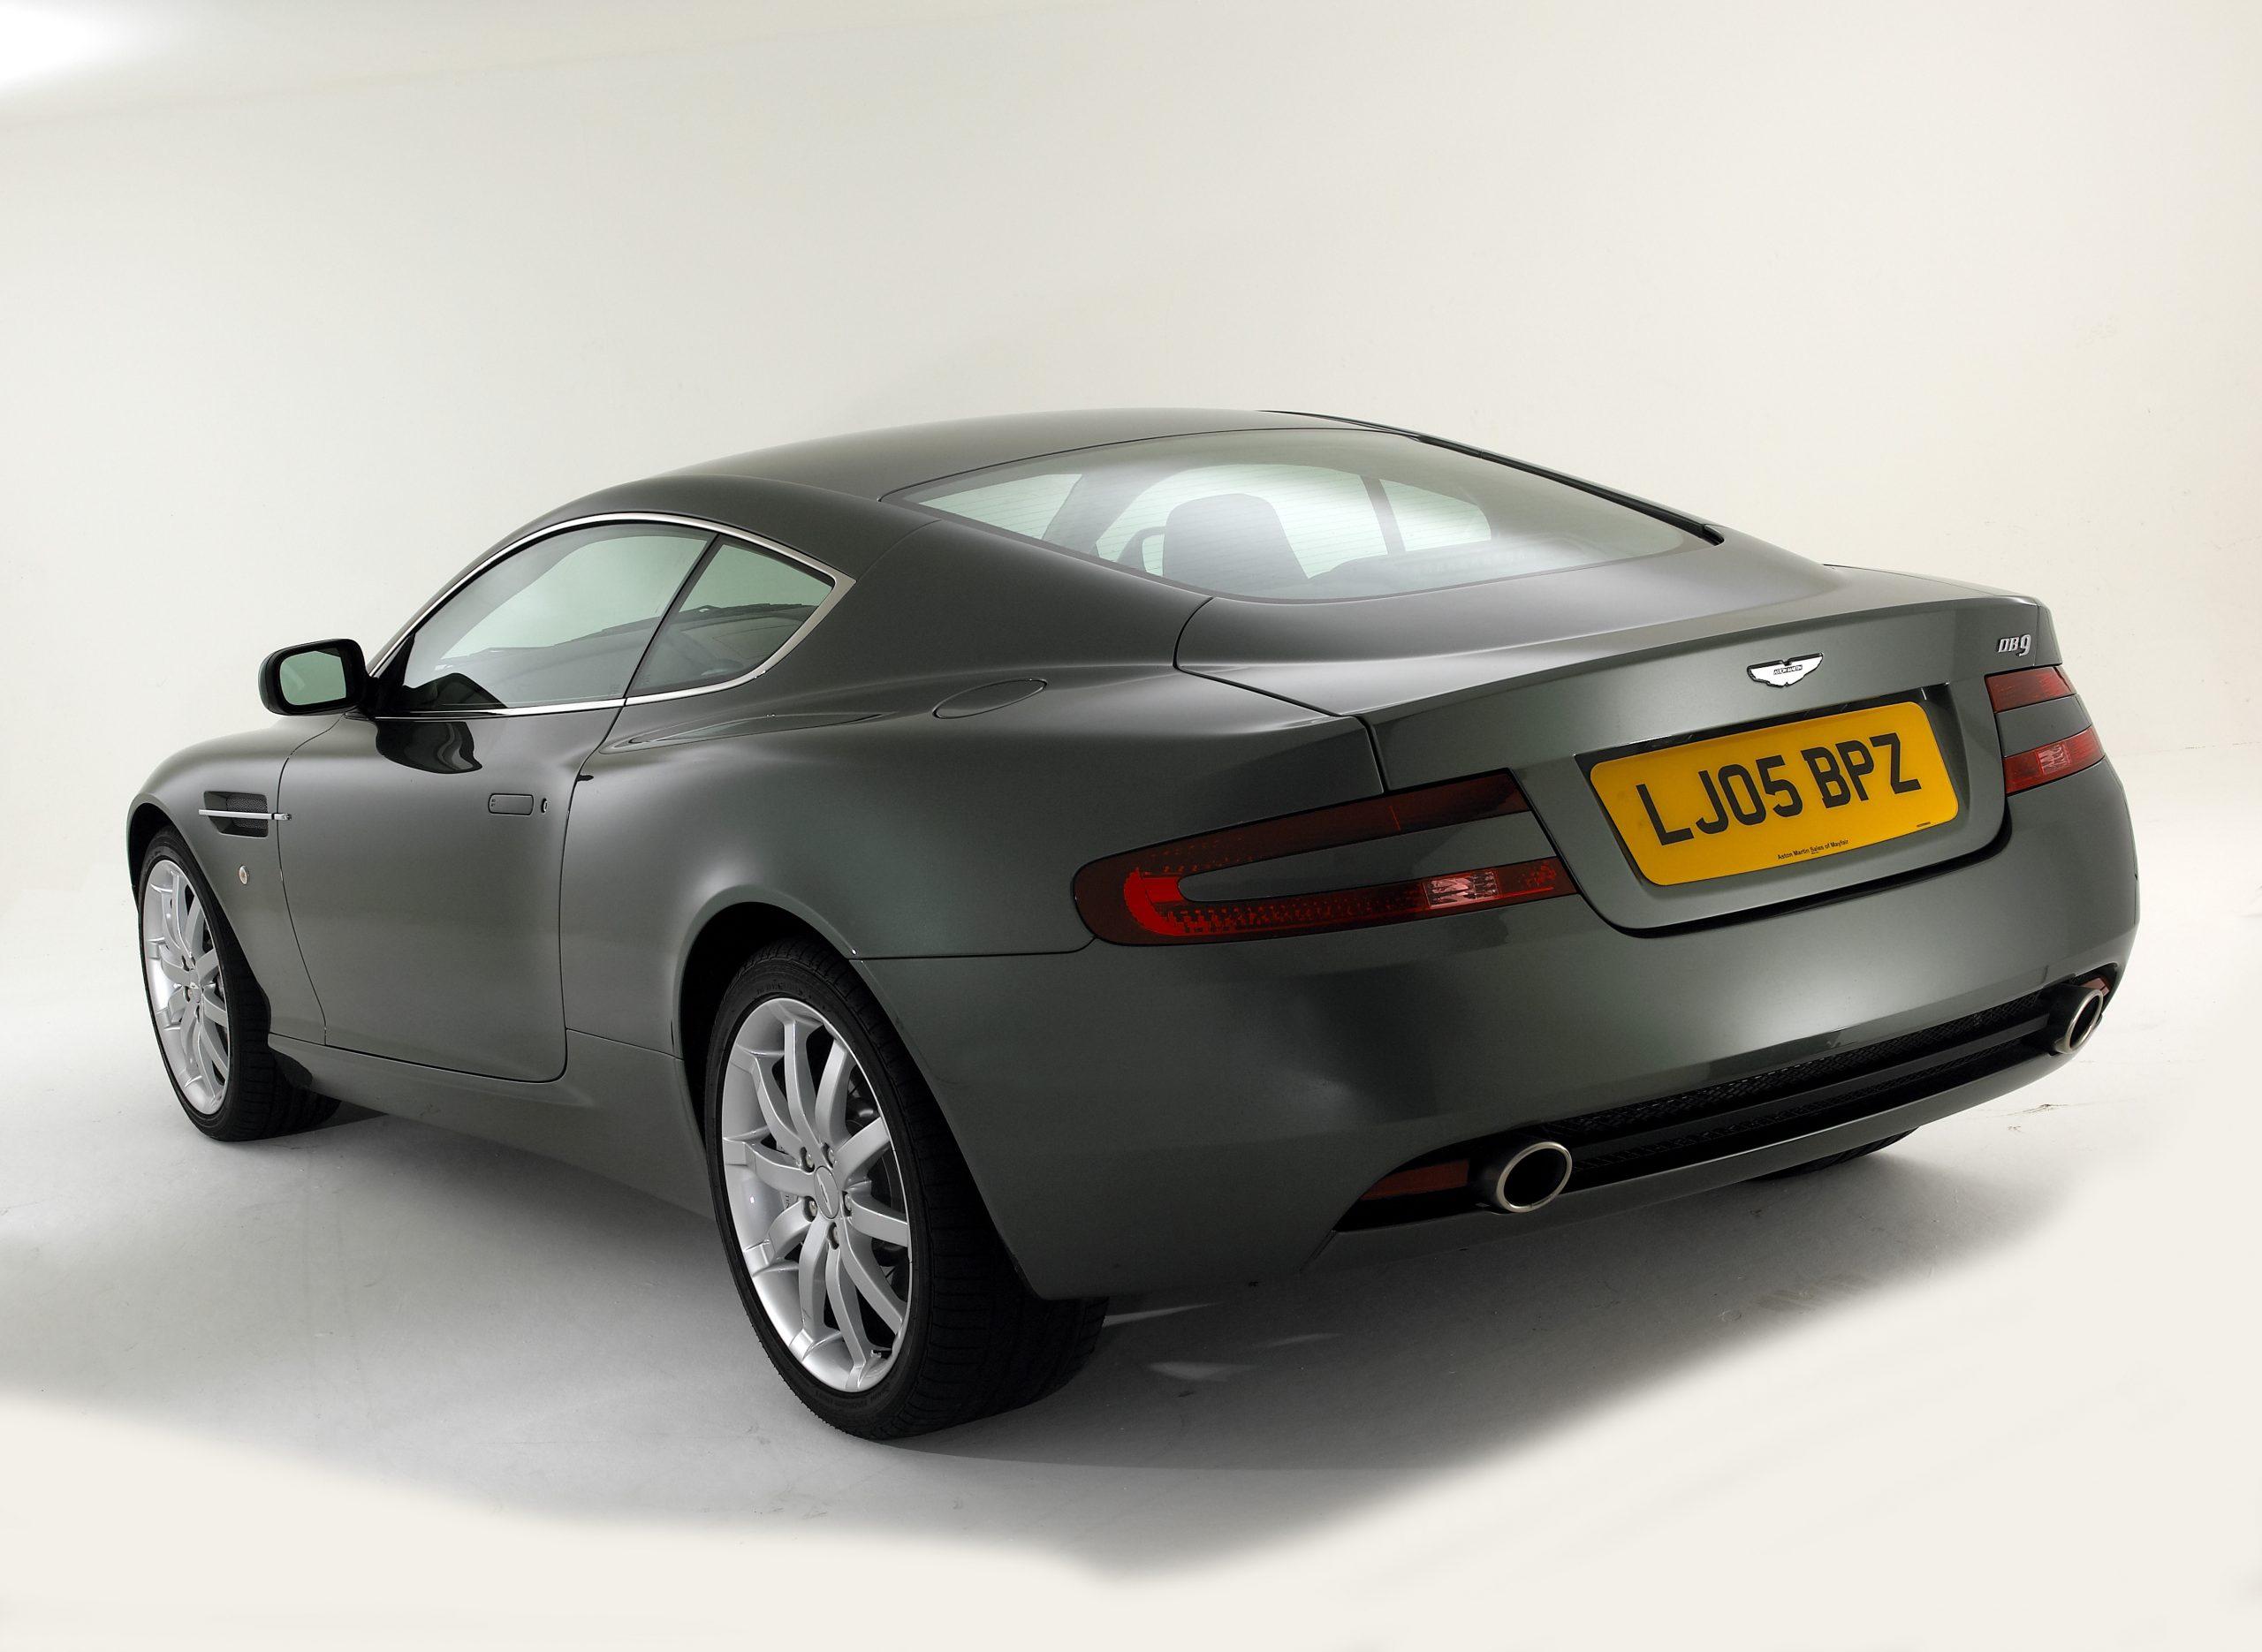 The rear 3/4 of the Aston Martin DB9 shot in a studio